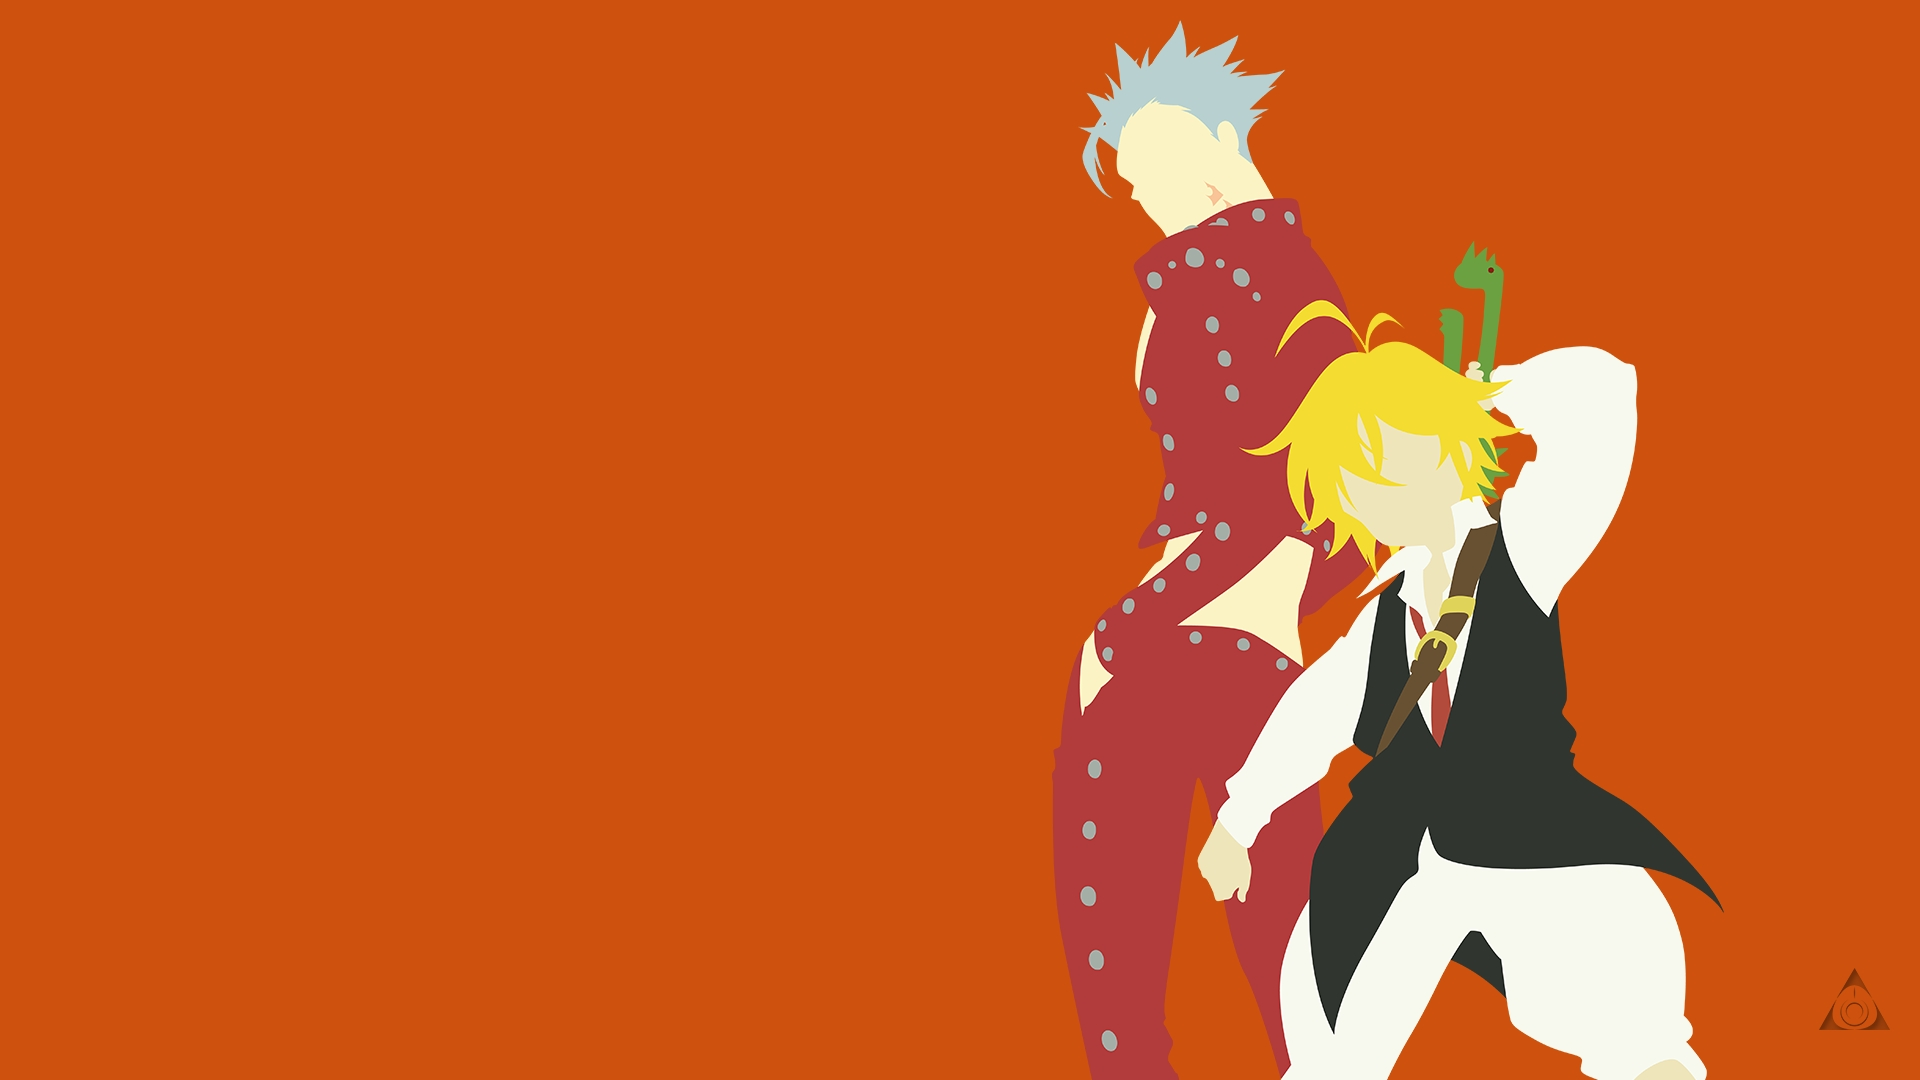 Anime Wallpaper Meliodas and Ban from Seven Deadly Sins